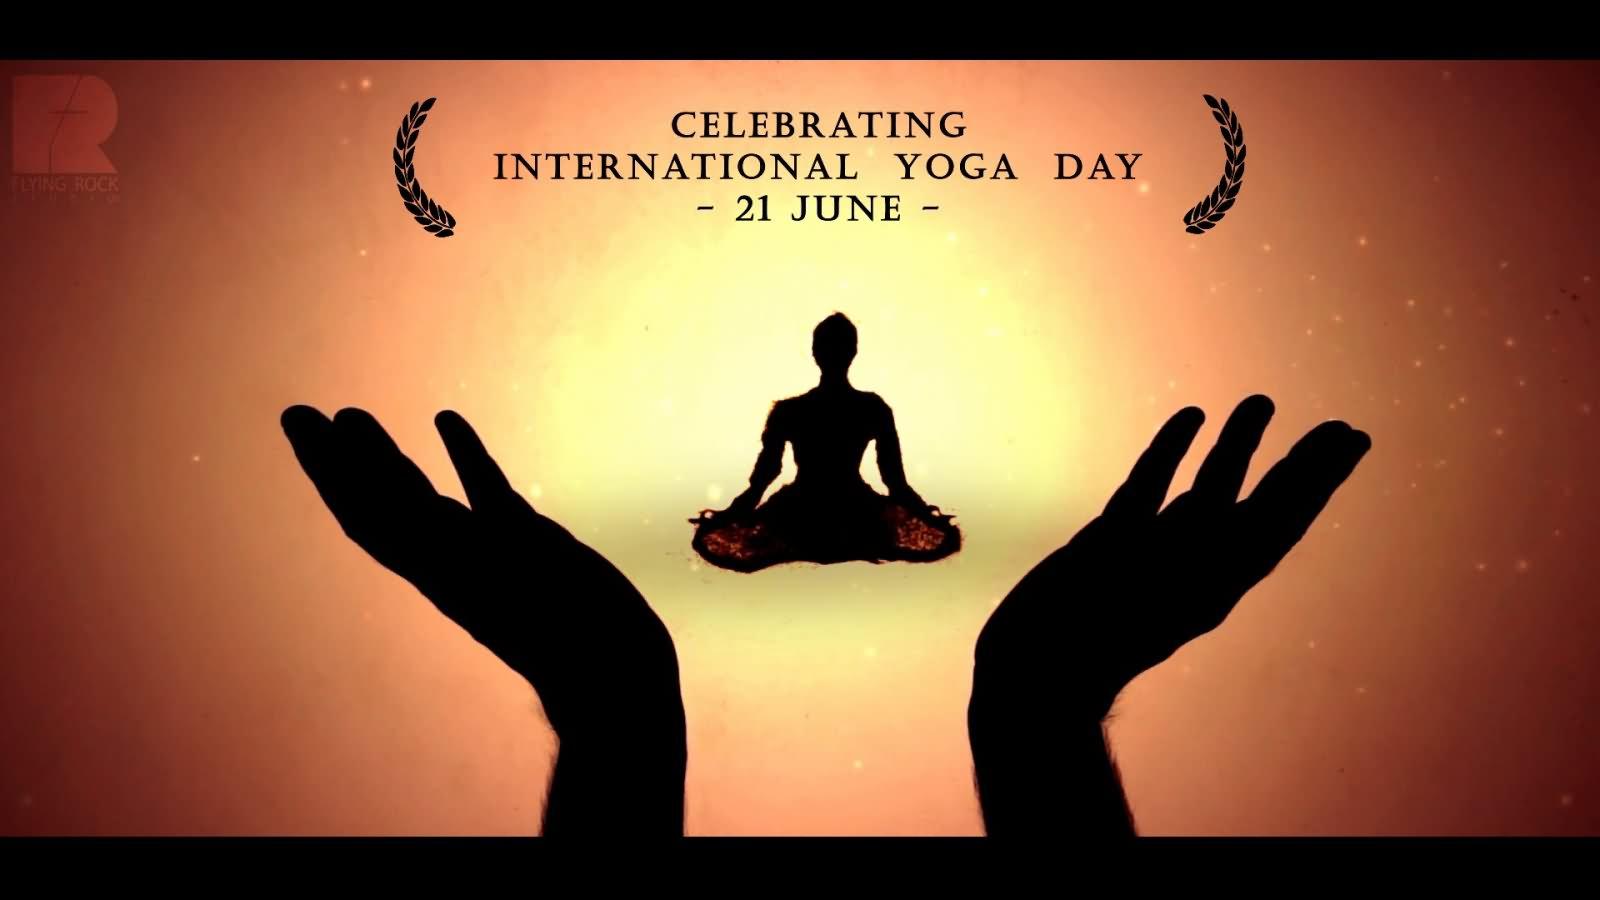 celebrating international yoga day 21 june